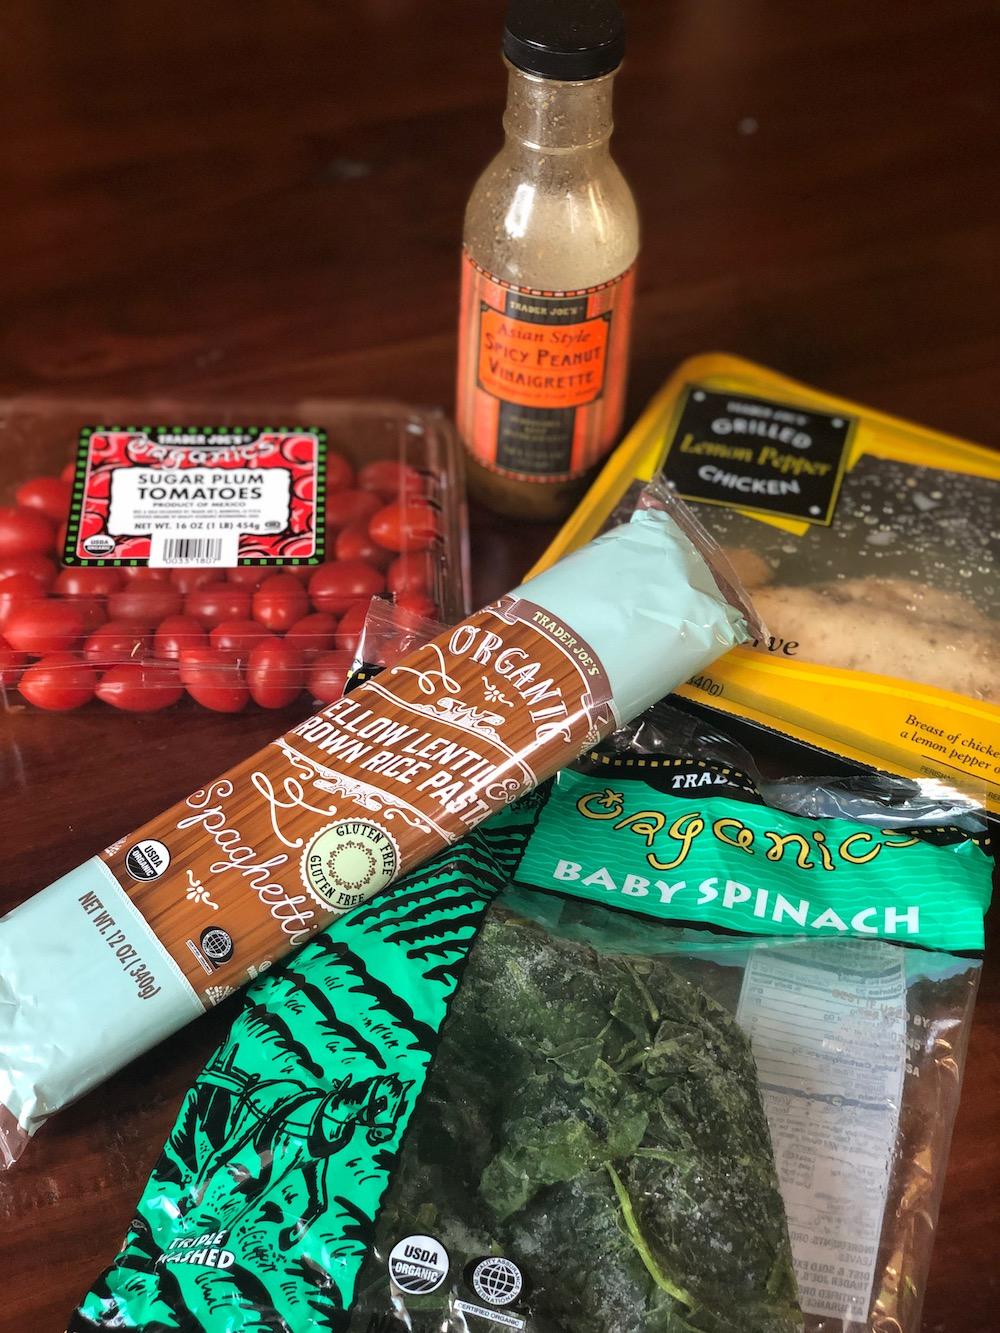 AAY Nutrition Recipe Trader Joe's Spicy Chicken Pasta Dinner Ingredients